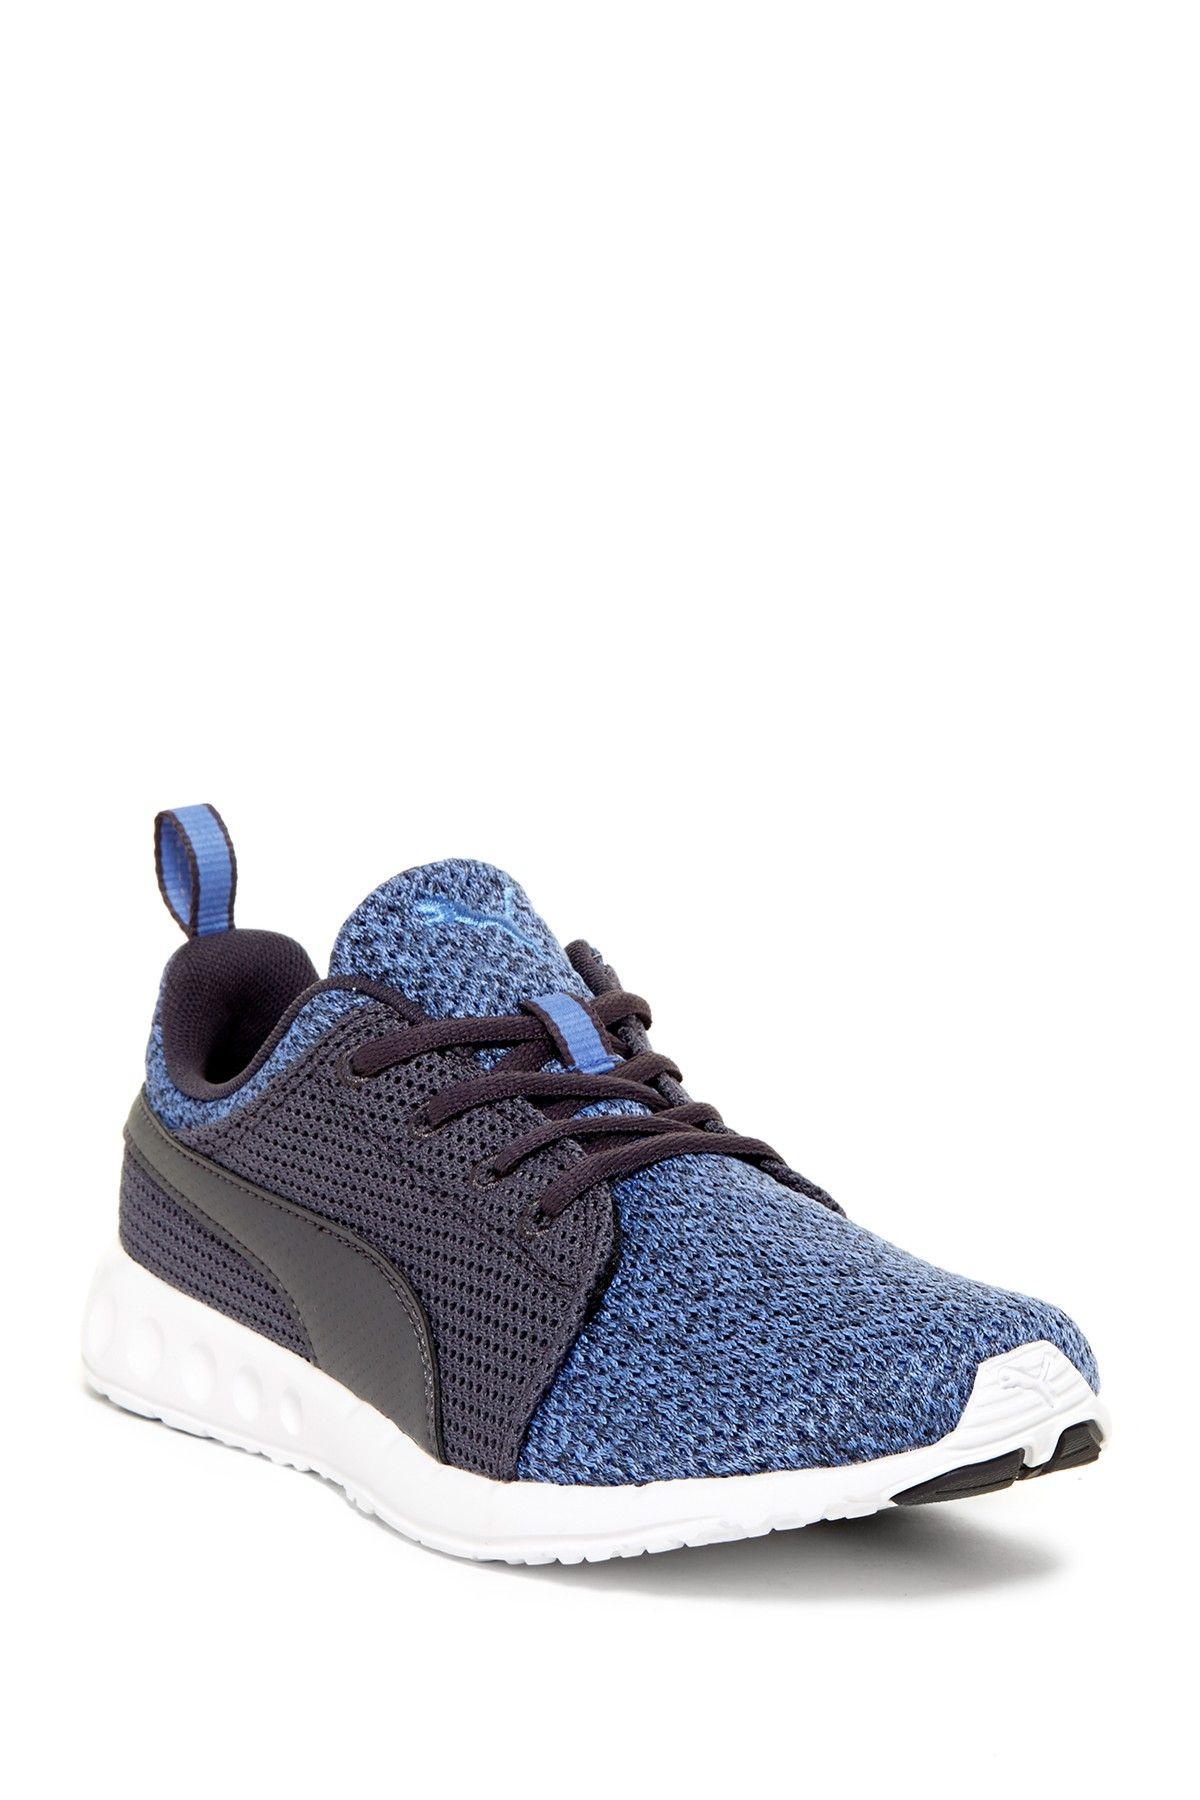 cliente Millas Estación  PUMA | Carson Heath Soft Foam Sneaker | Nordstrom Rack | Foams sneakers,  Sneakers, Puma